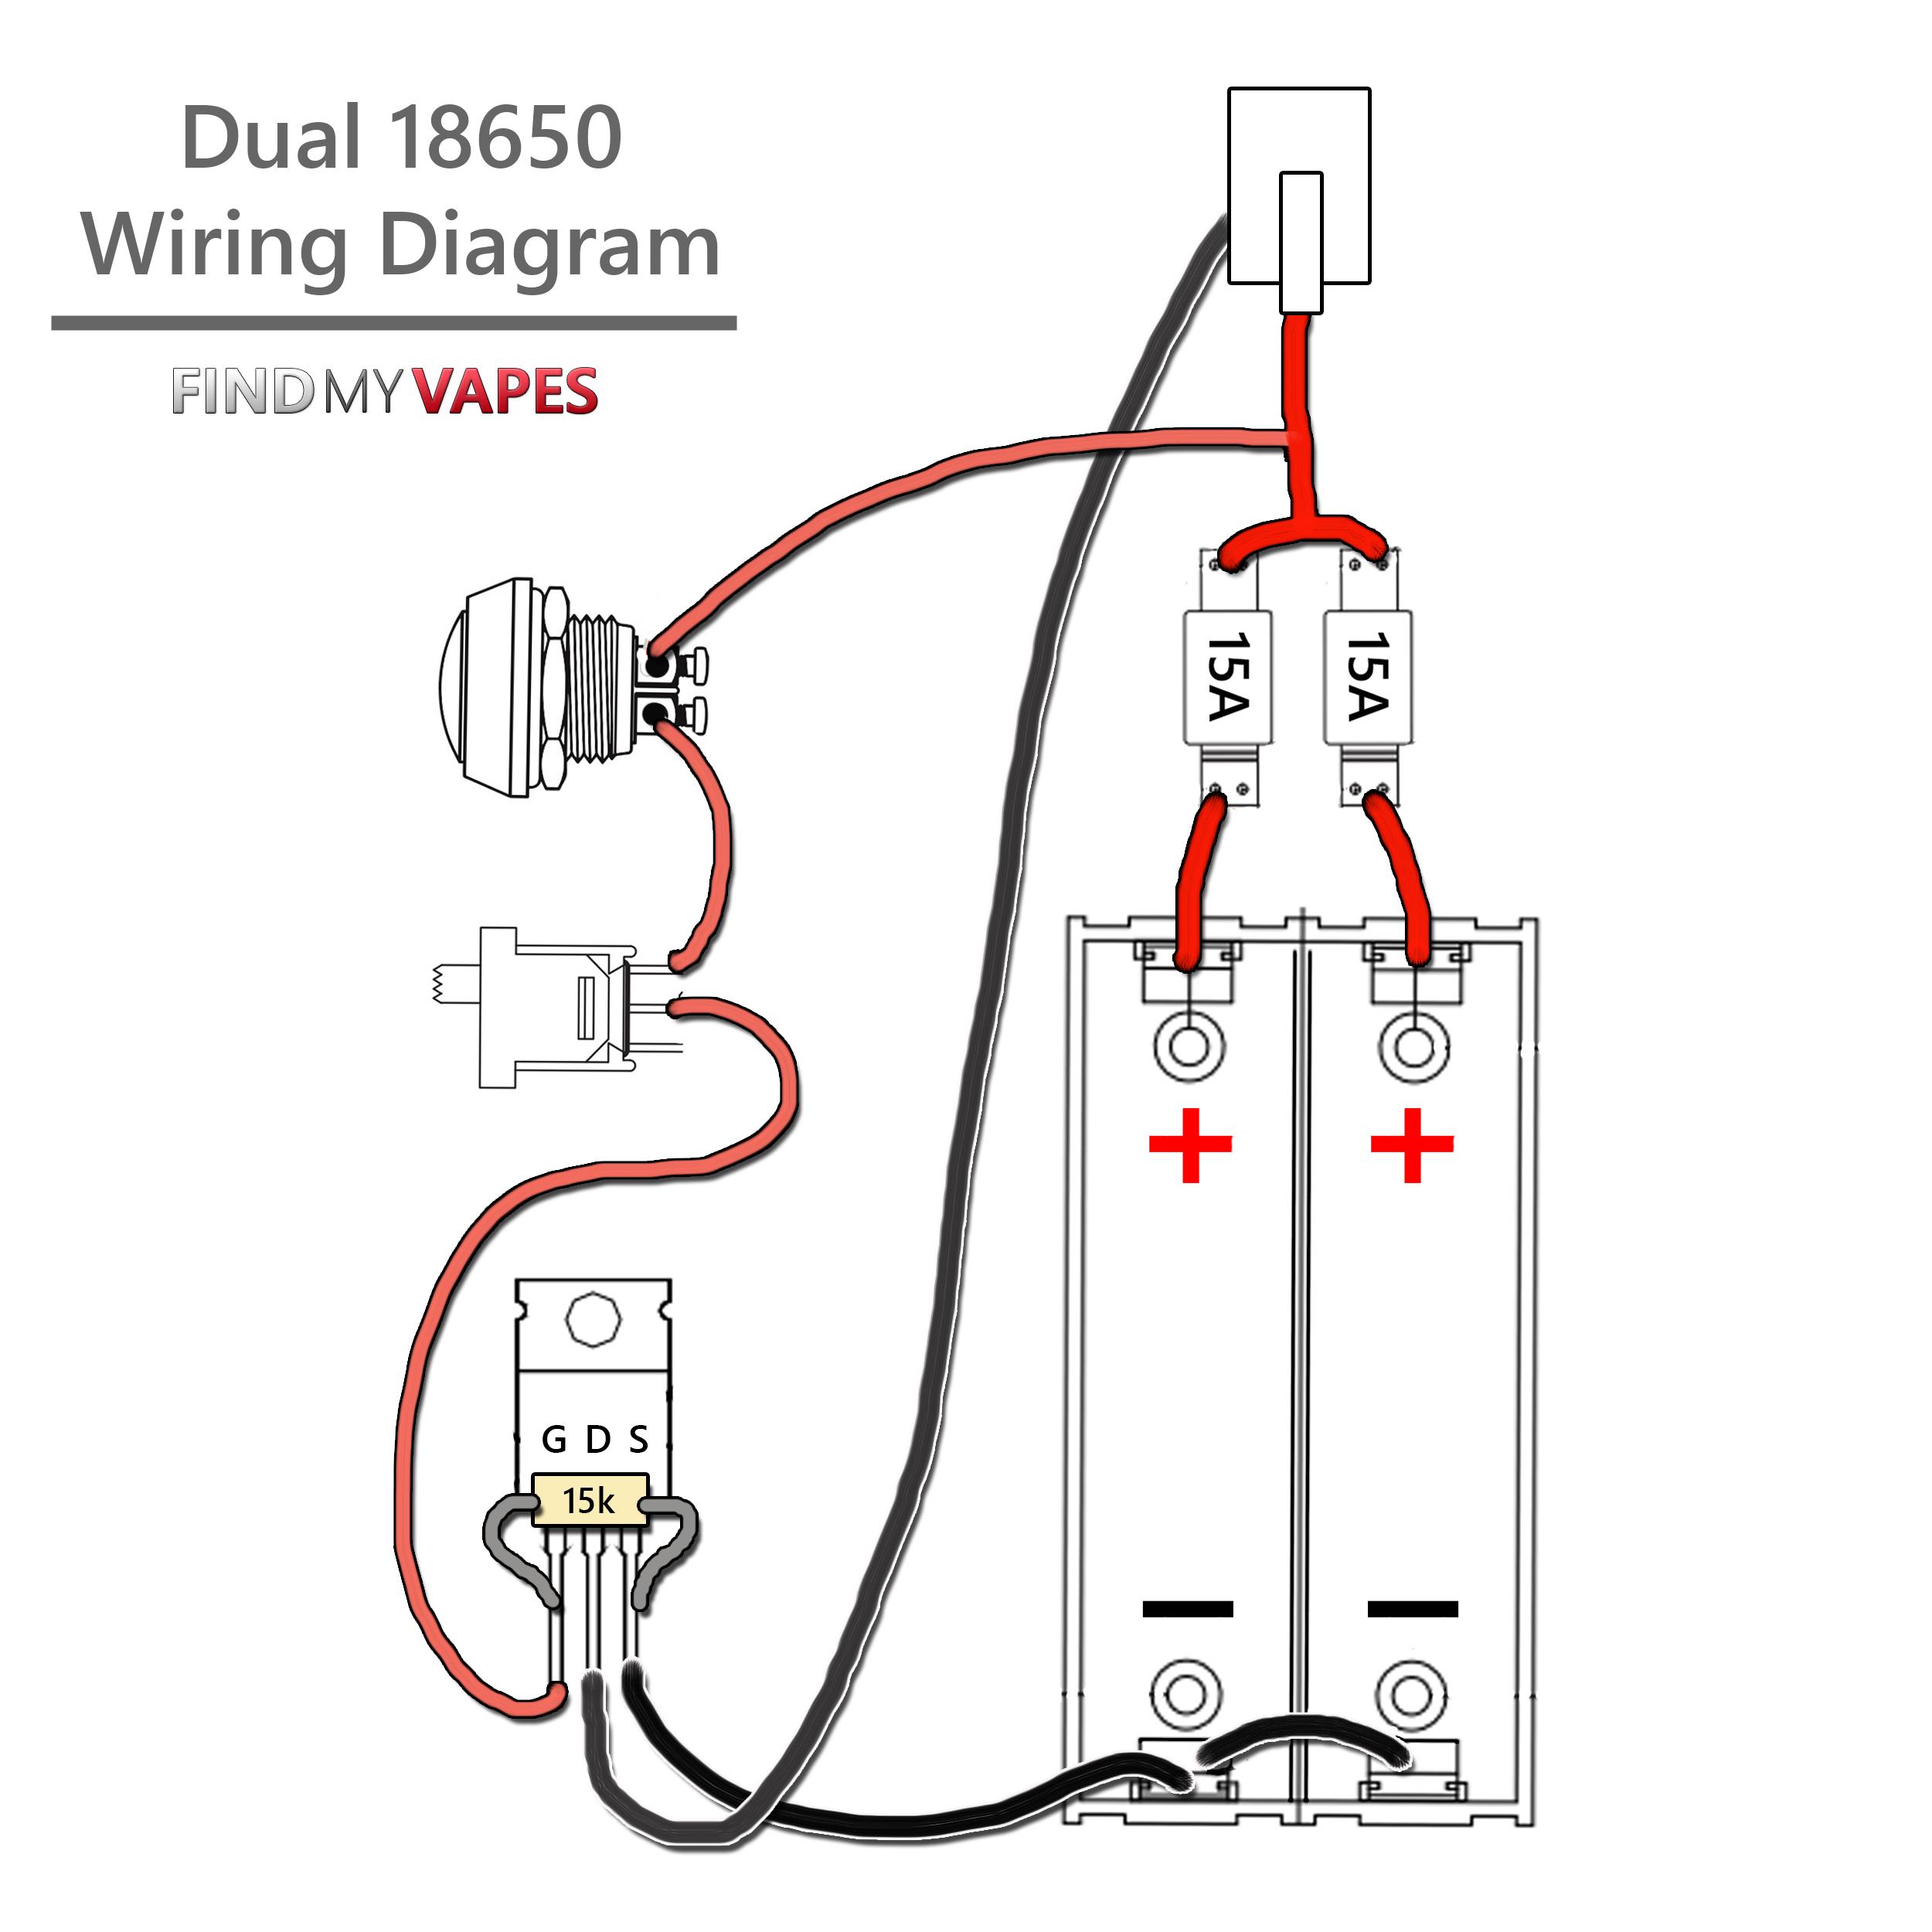 Mod Wiring Diagram | Wiring Diagram on